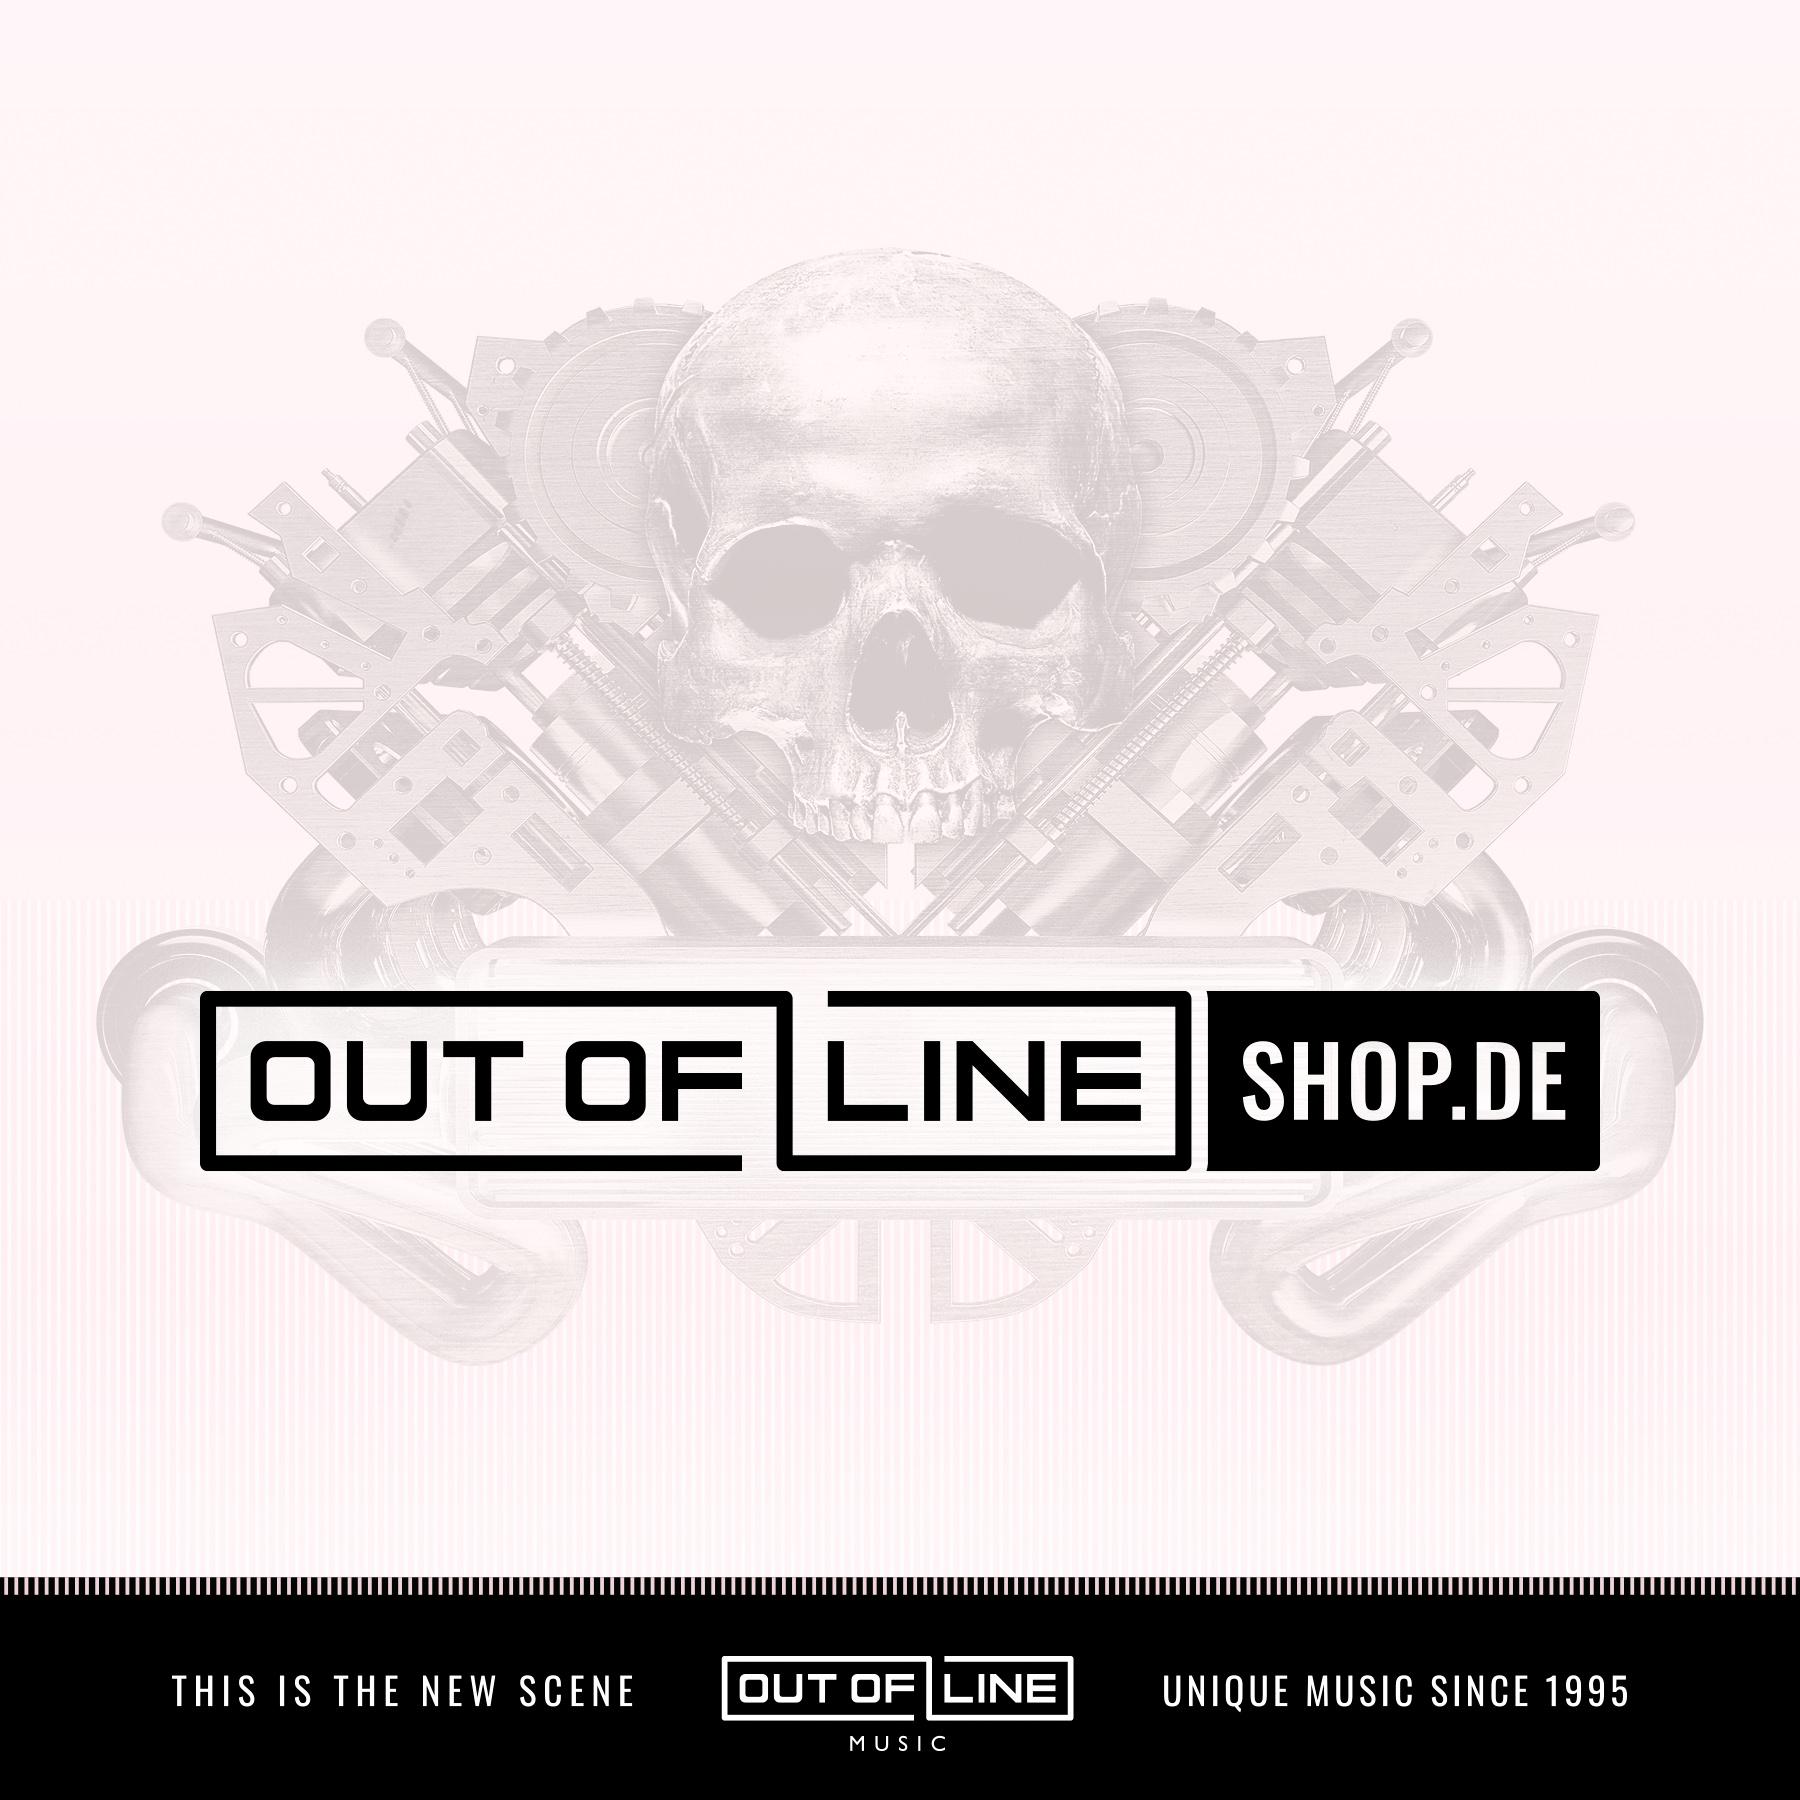 Camera Obscura - Teenager (25th Elefant Anniversary Reissue) - Vinyl/Single